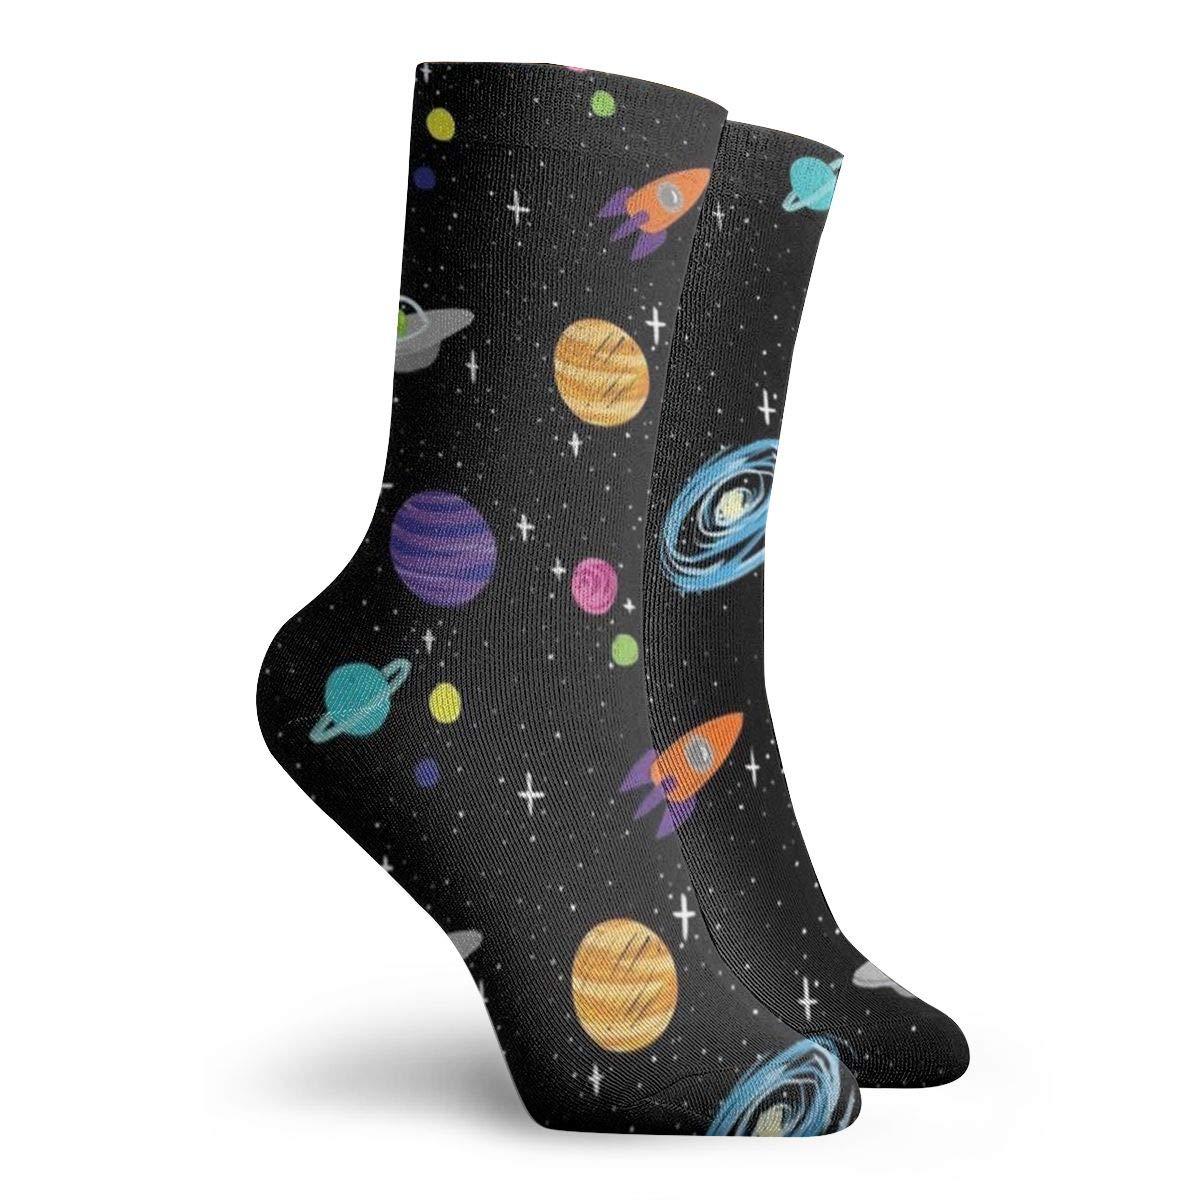 Planet Unisex Funny Casual Crew Socks Athletic Socks For Boys Girls Kids Teenagers